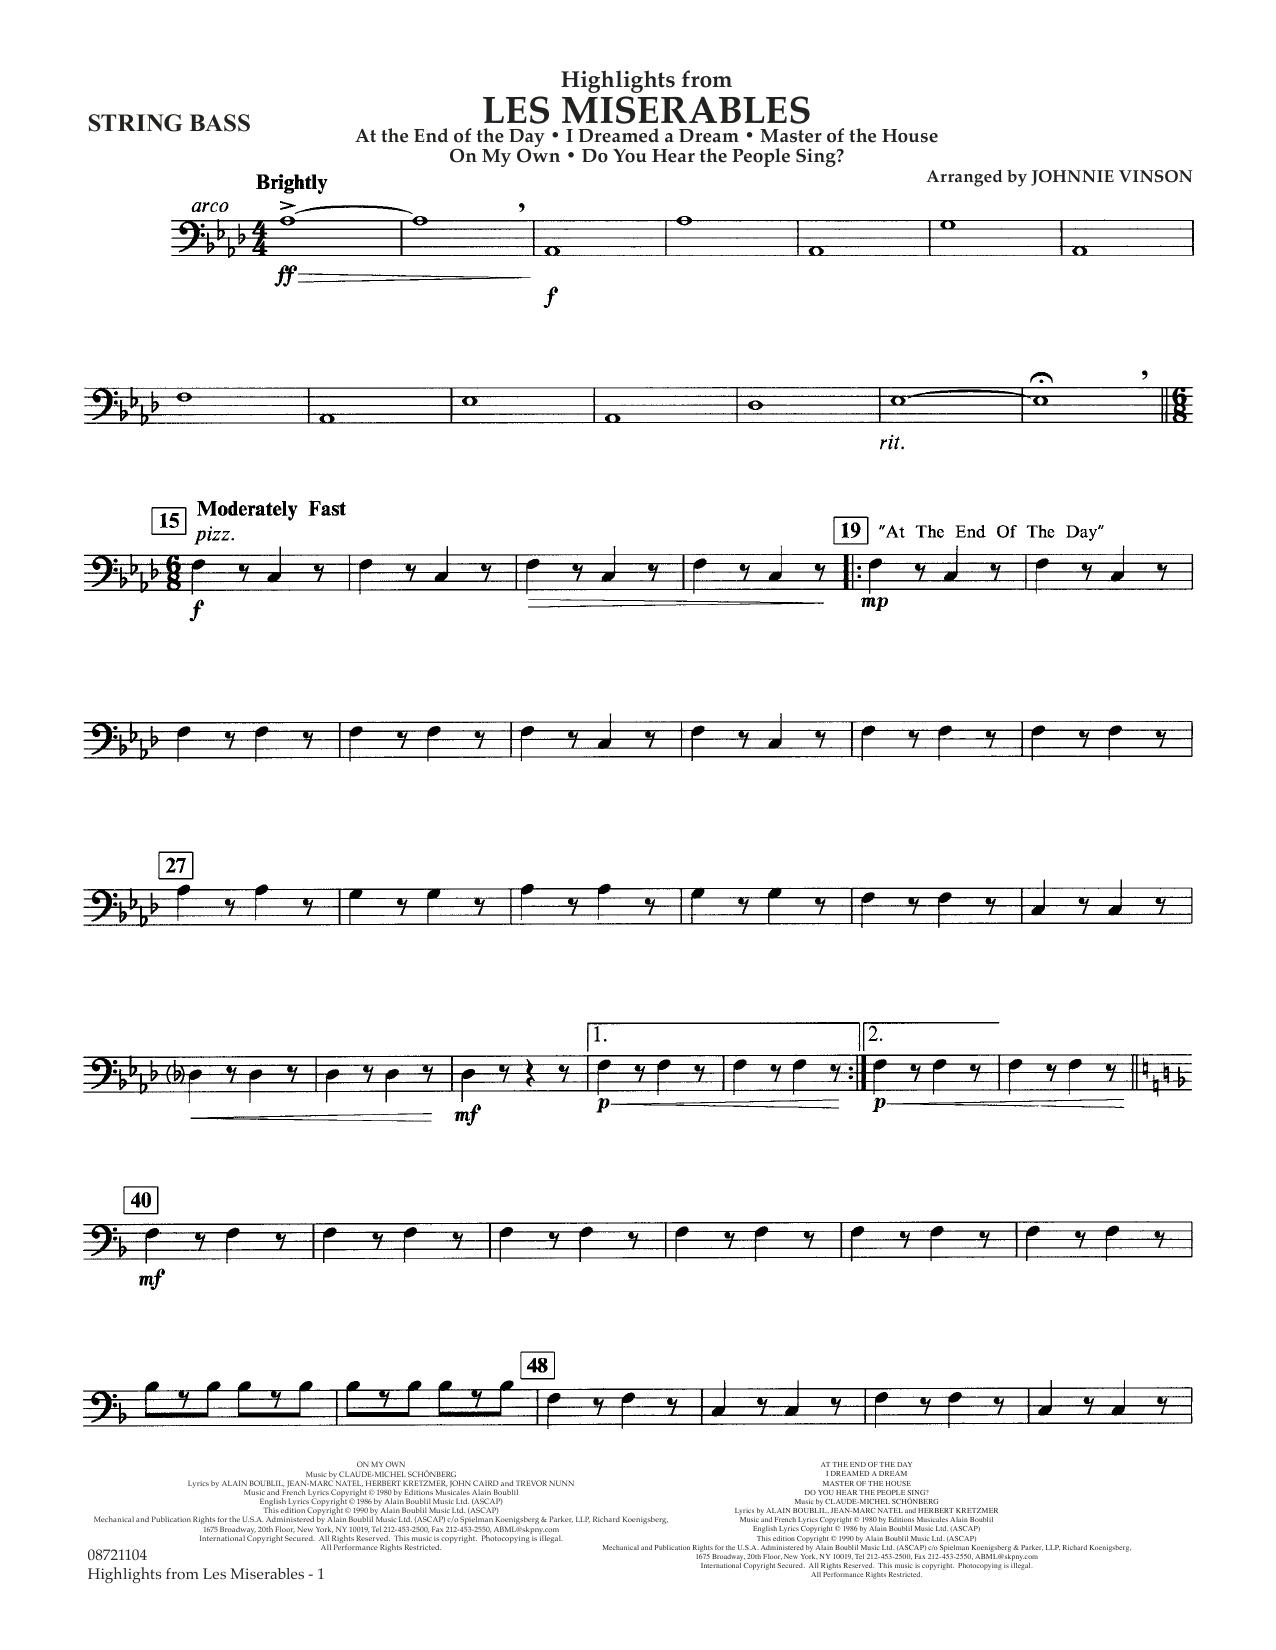 Highlights from Les Misérables (arr. Johnnie Vinson) - String Bass (Concert Band)